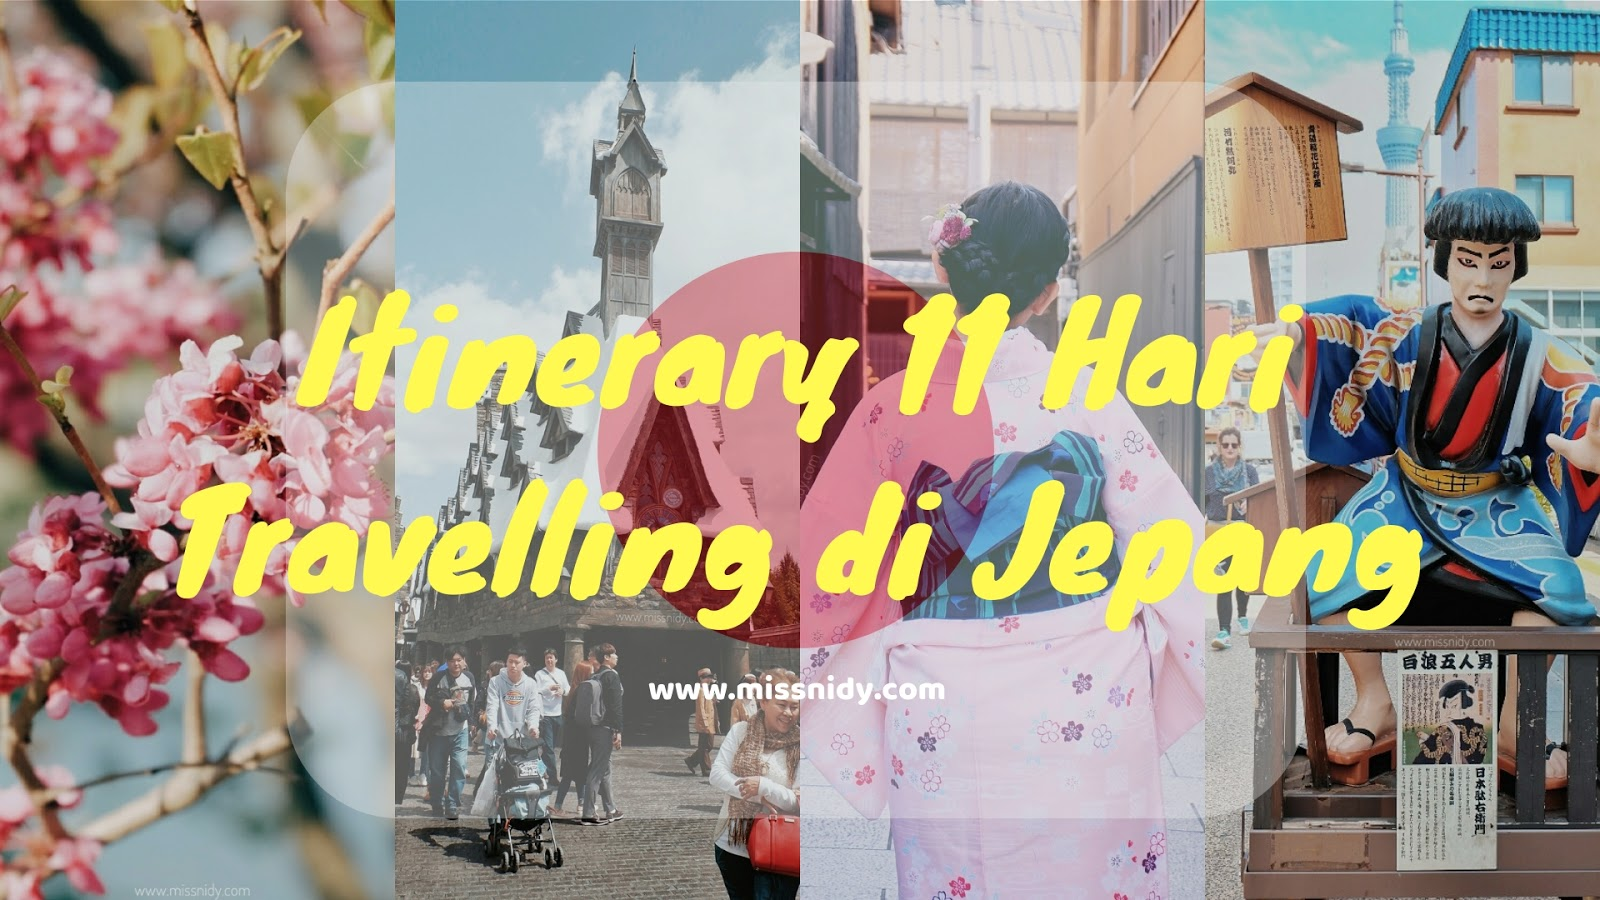 itinerary 11 hari travelling di jepang